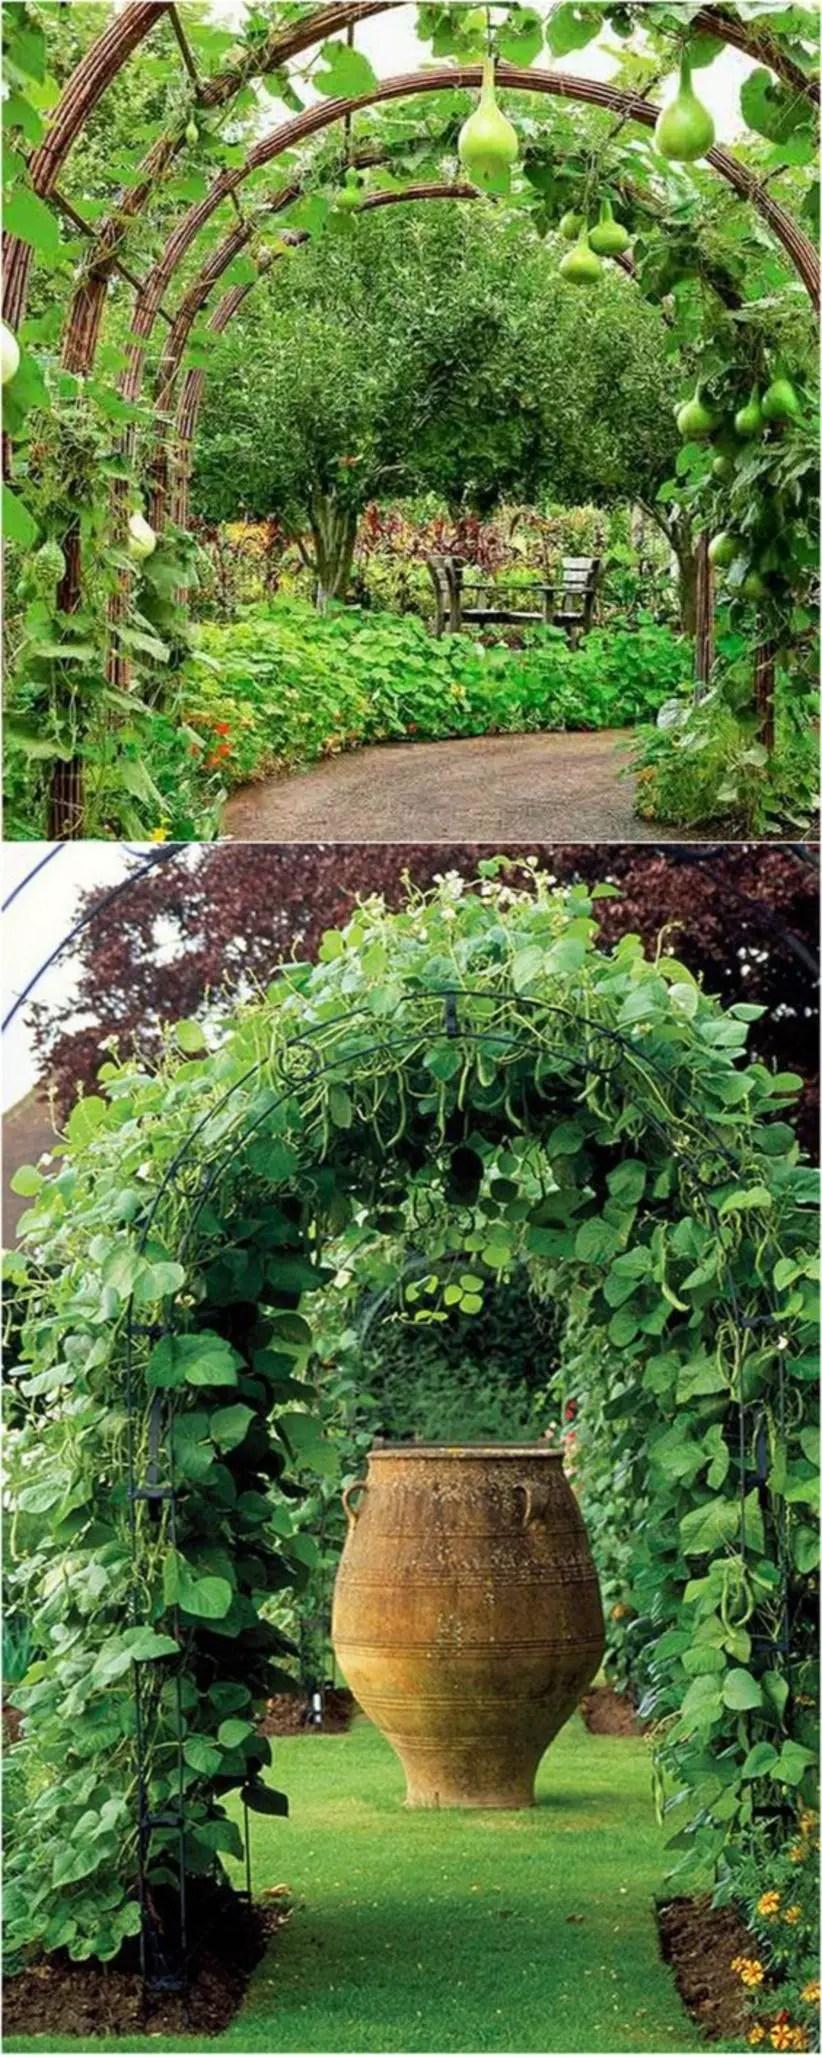 Diy friendly trellis and garden structures